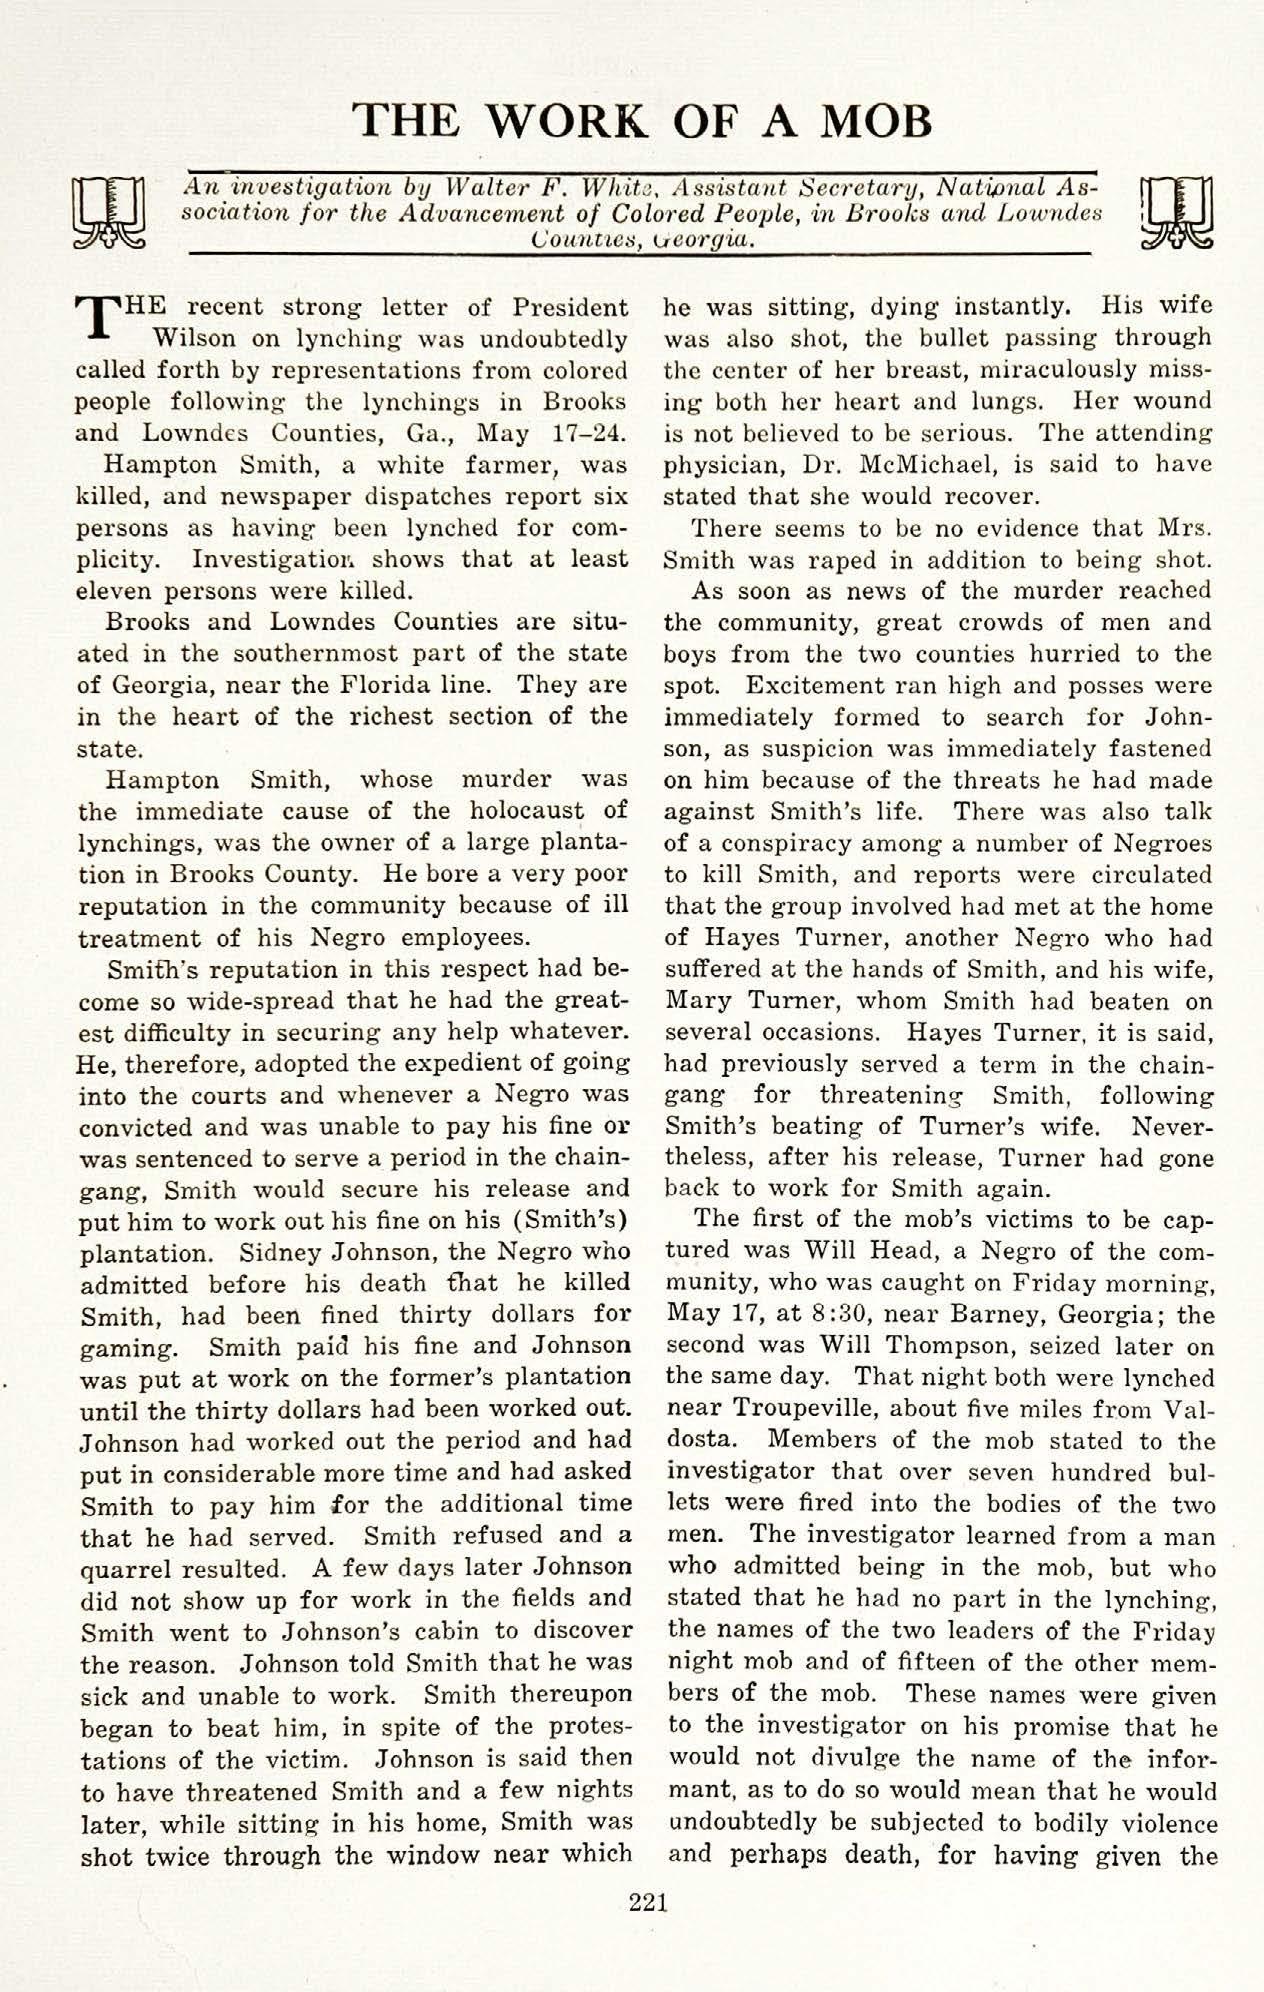 walter_white_mary_turner_1918_Page_1.jpg